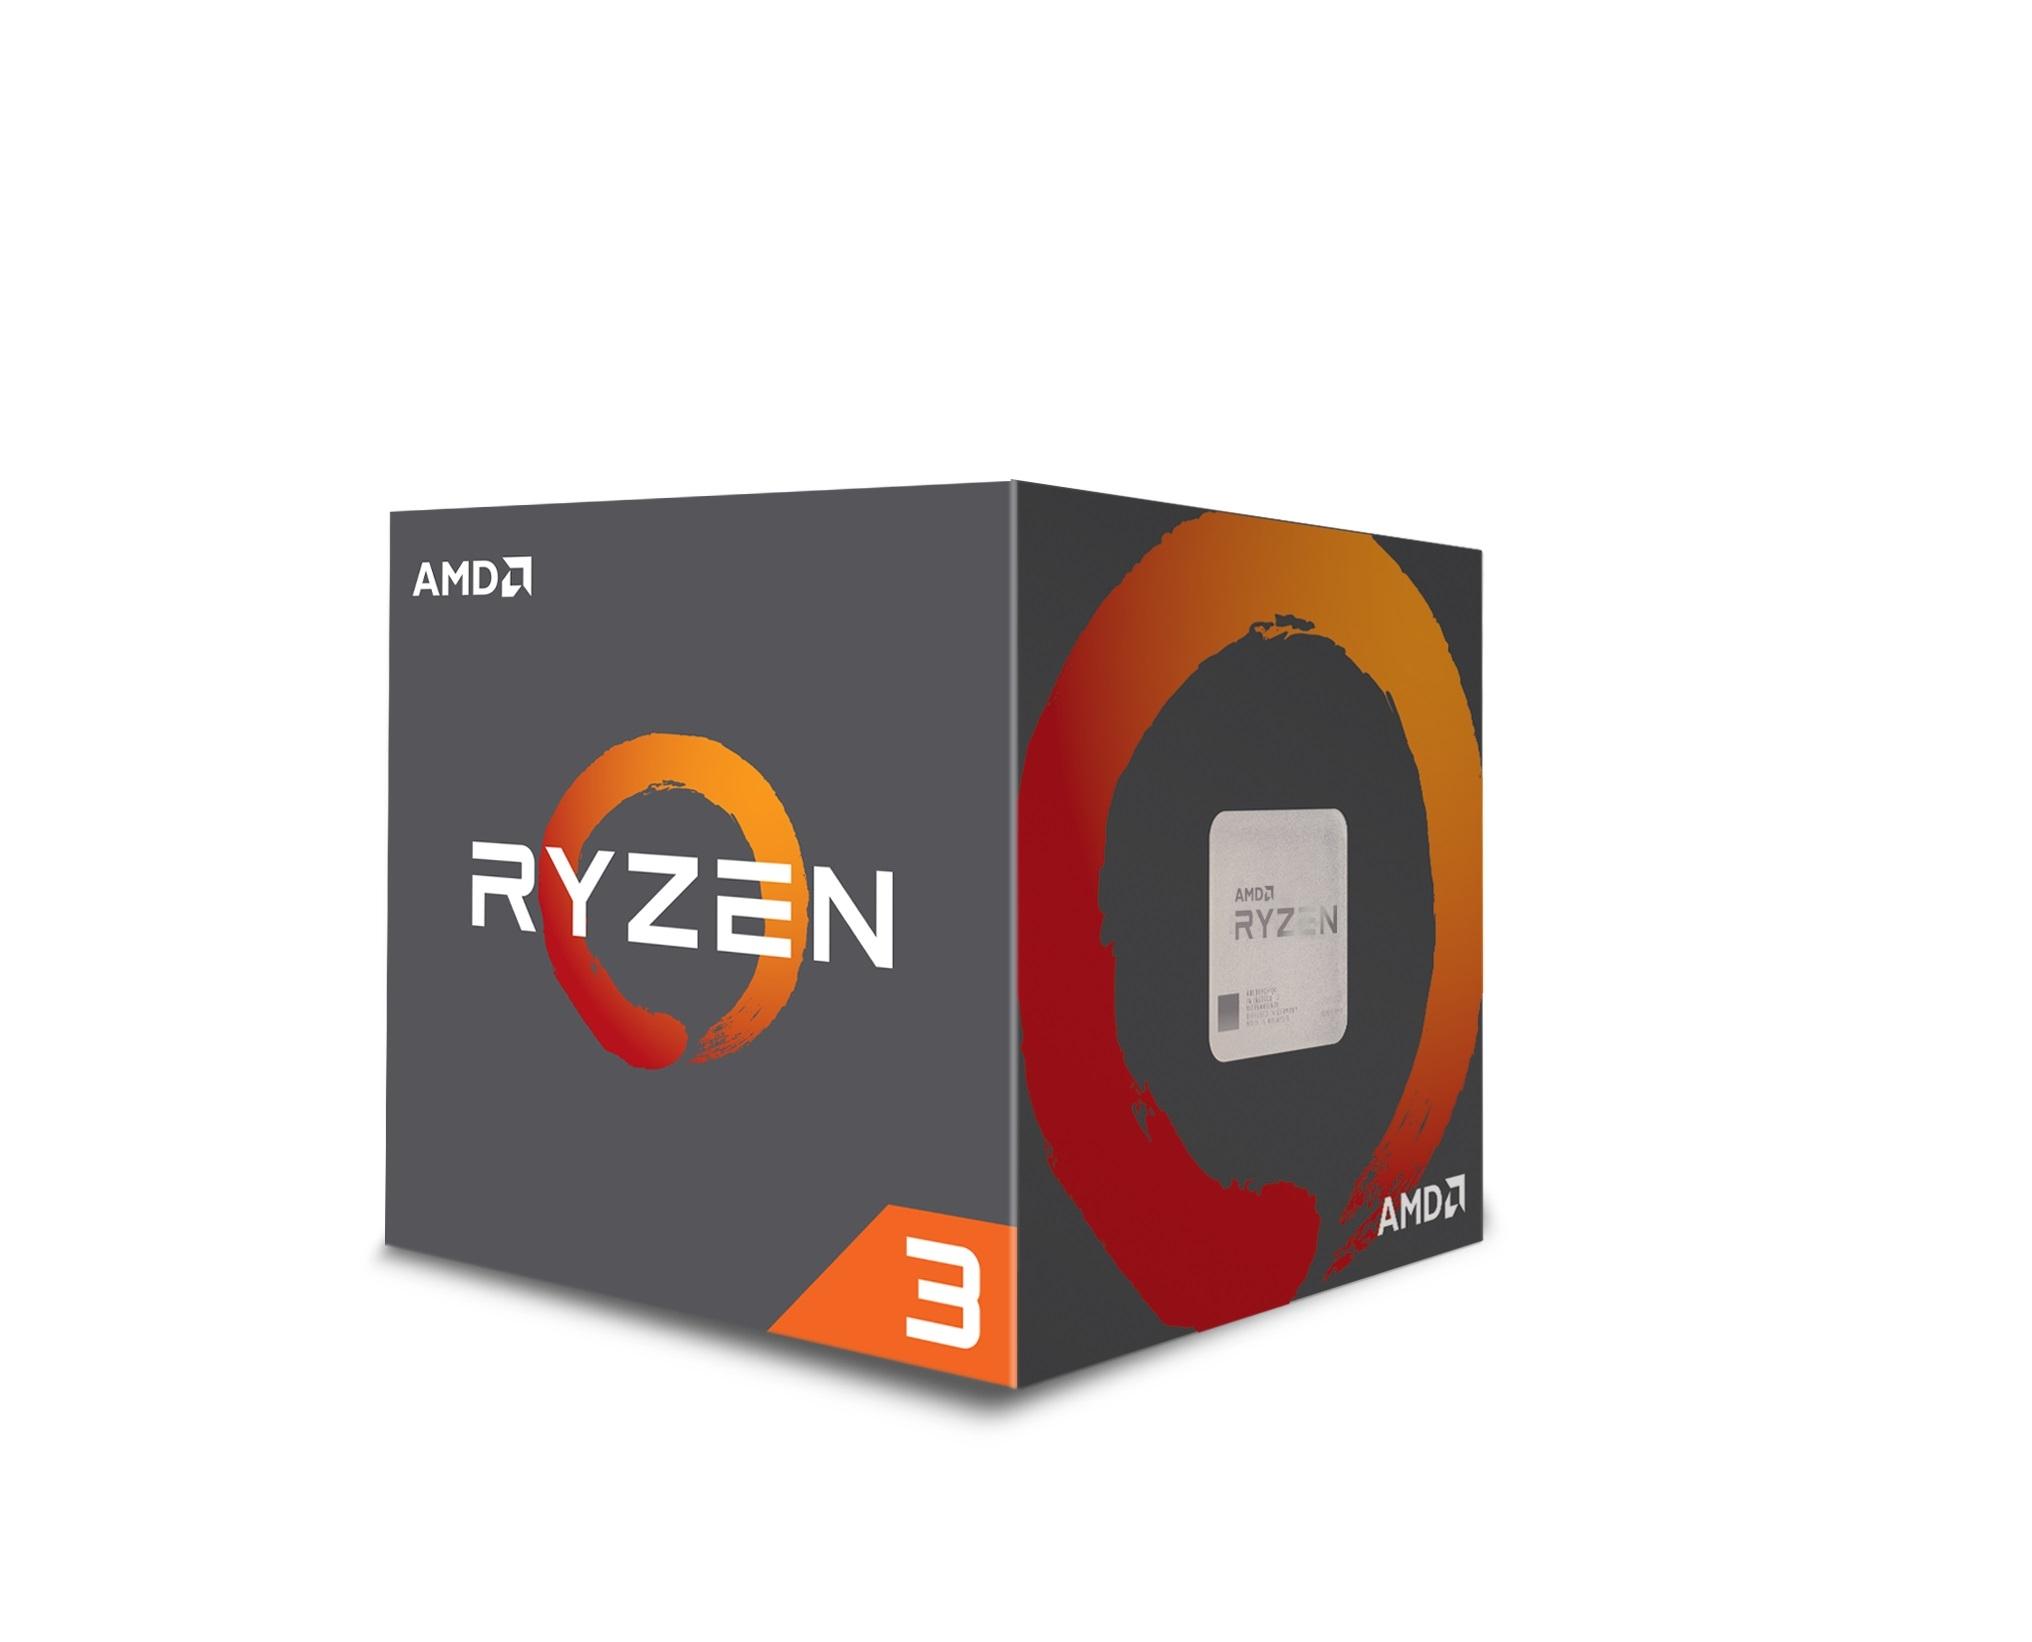 Procesor AMD Ryzen 3 1200 3.4 GHz 10MB